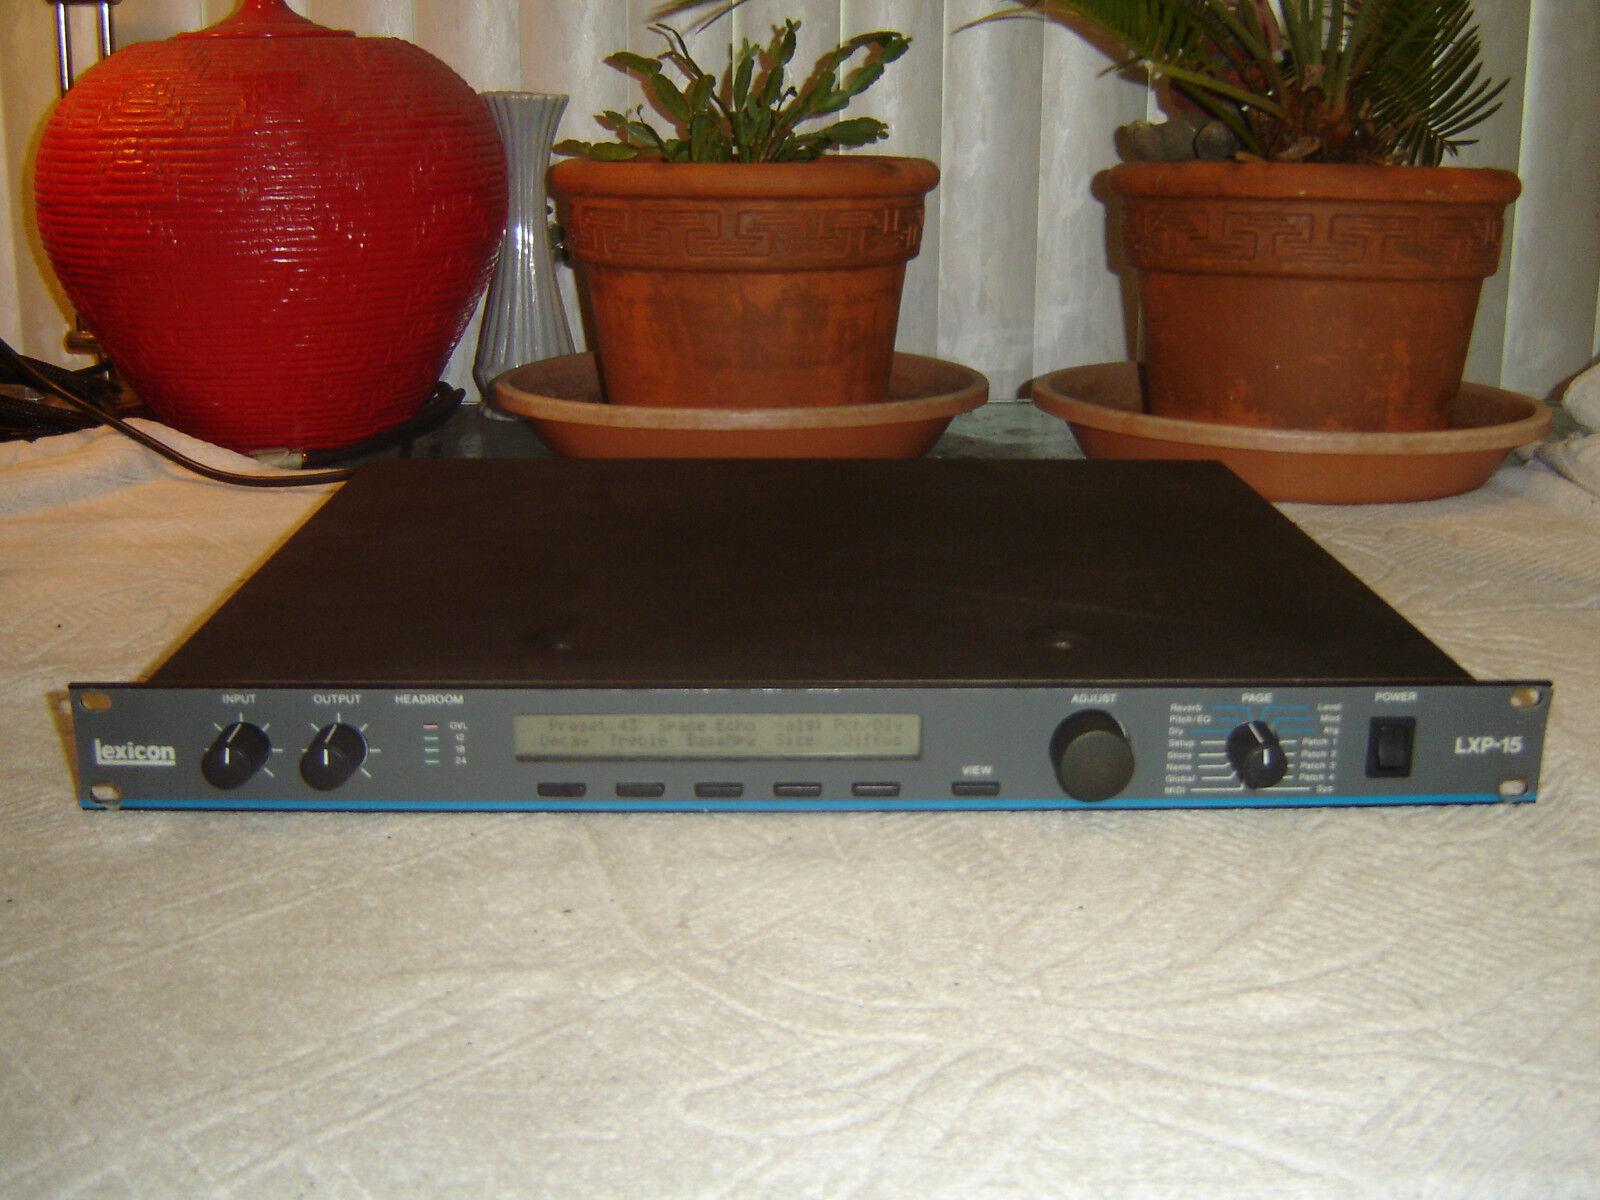 Lexicon LXP-15, Digital Effects Processor, Reverb, Pitch Eq, Delay, USA, Vintage